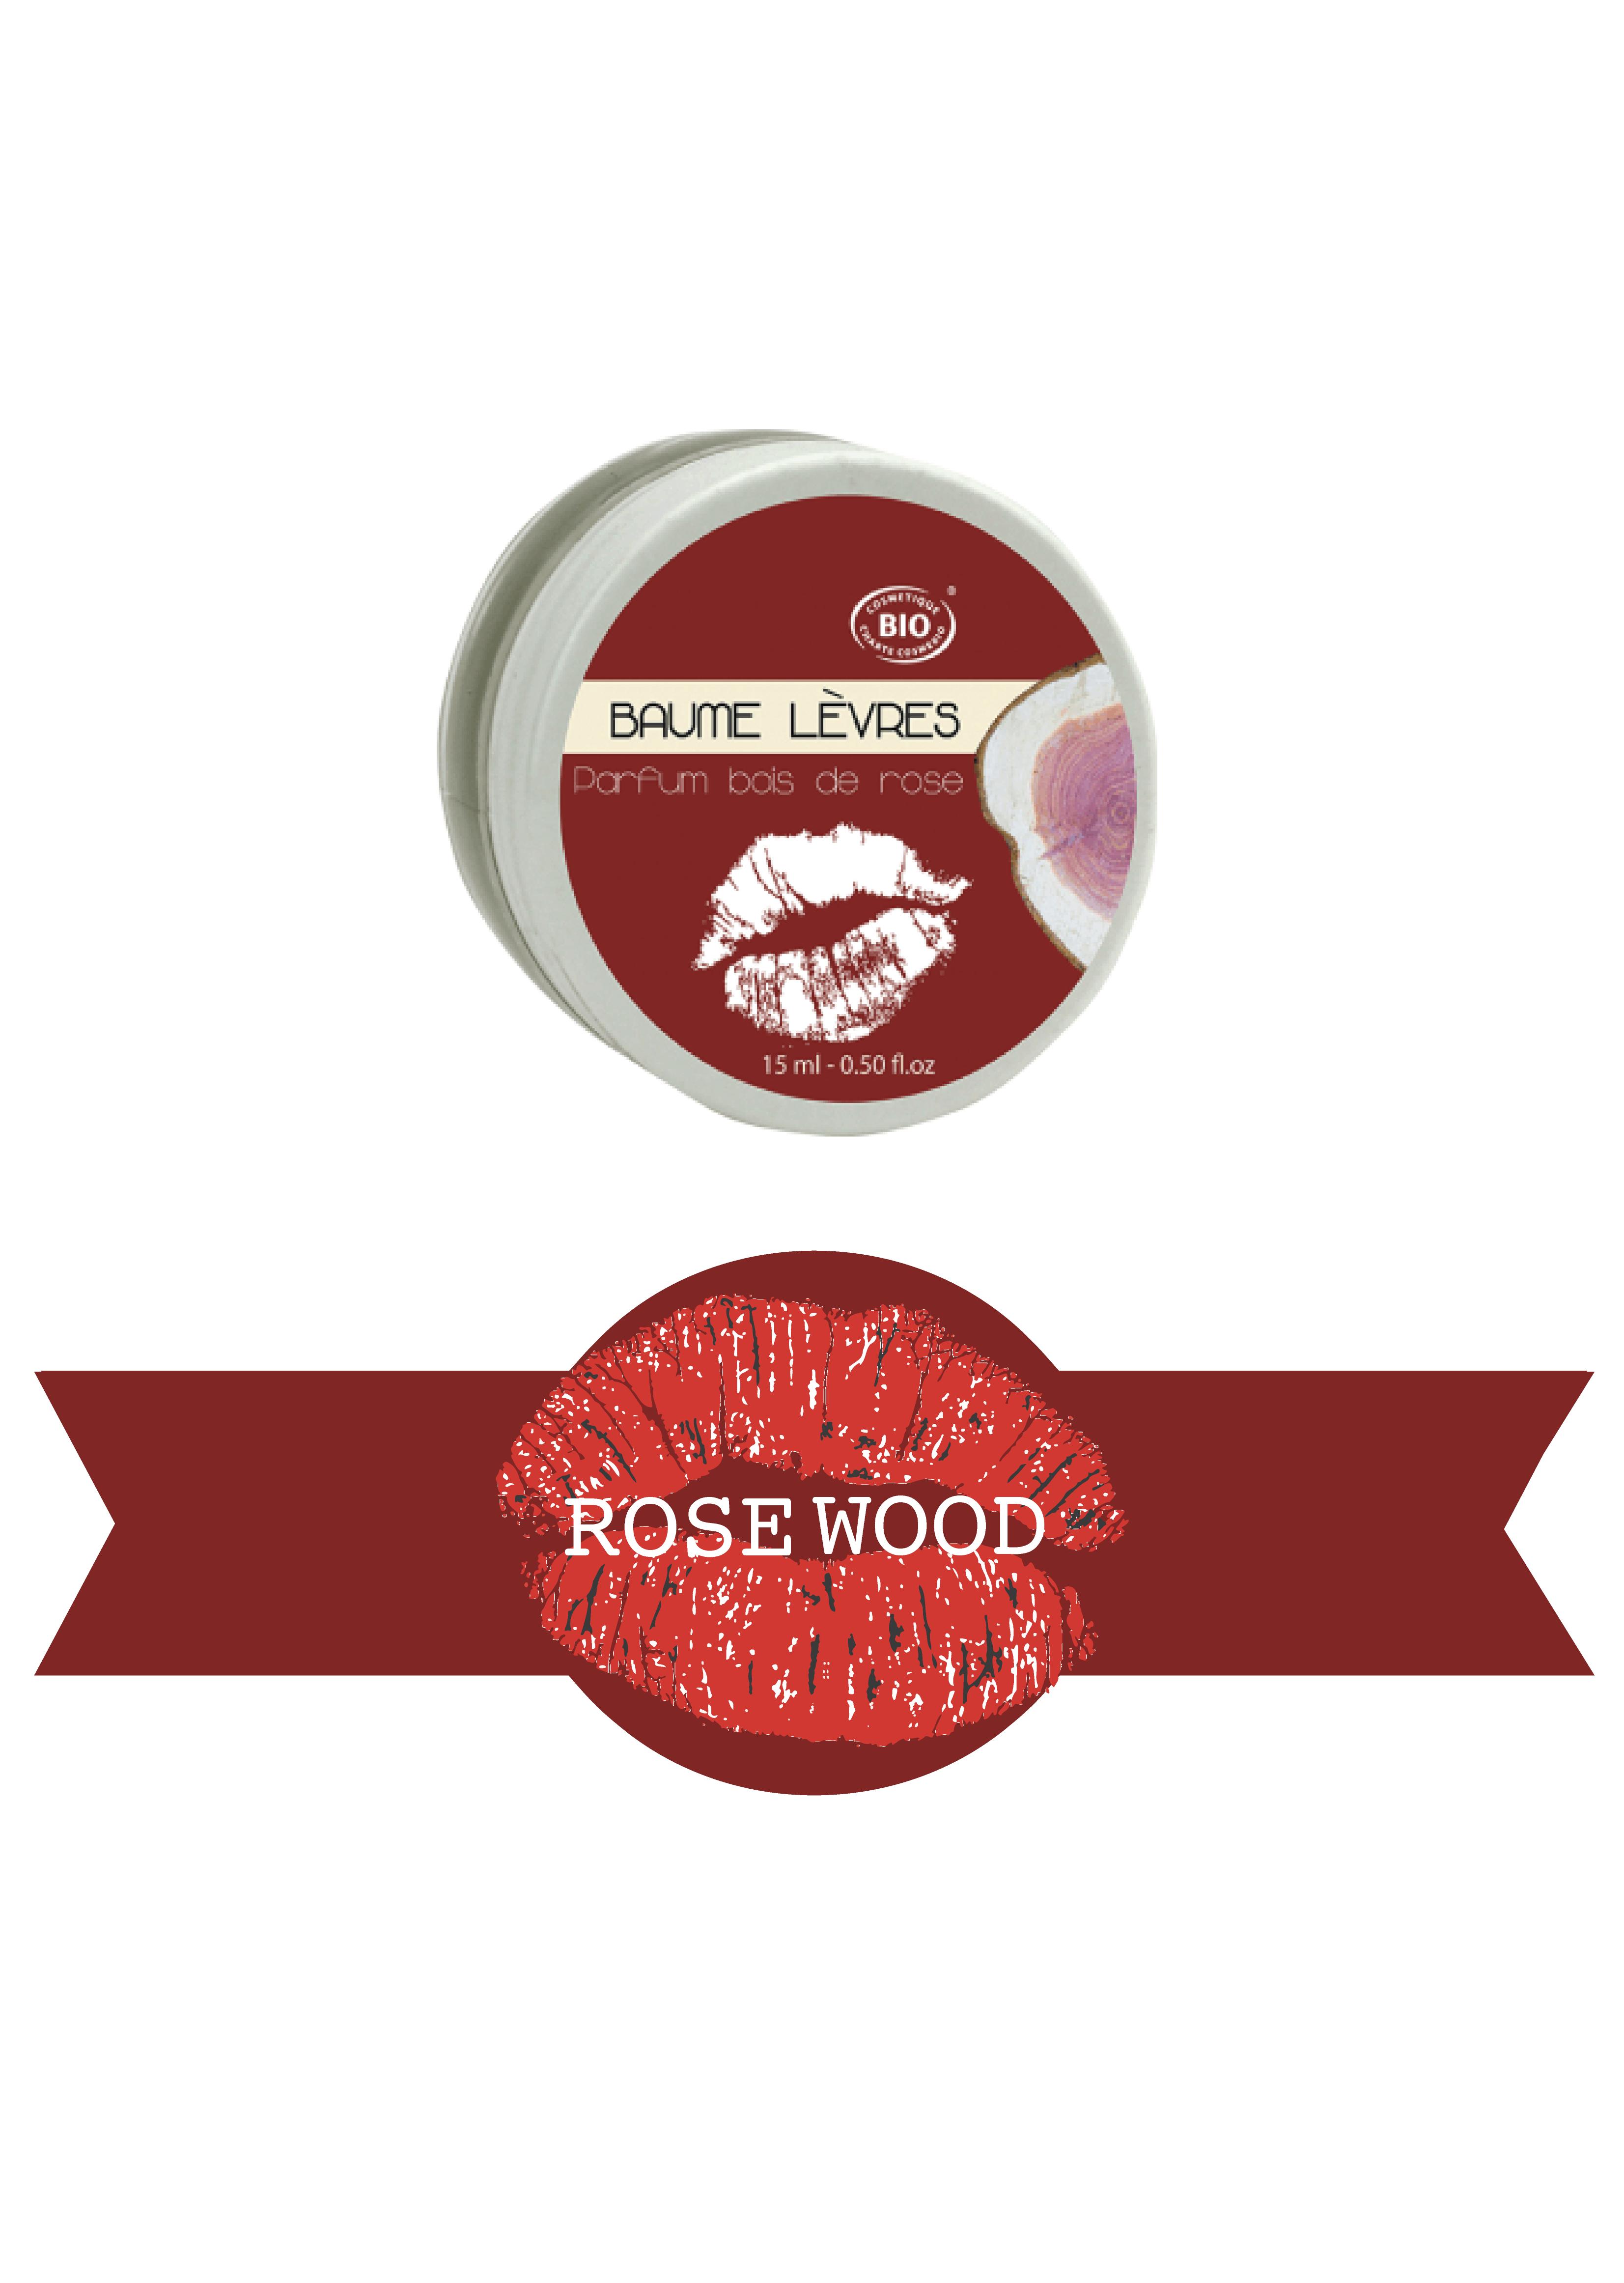 Rosewood lip balm